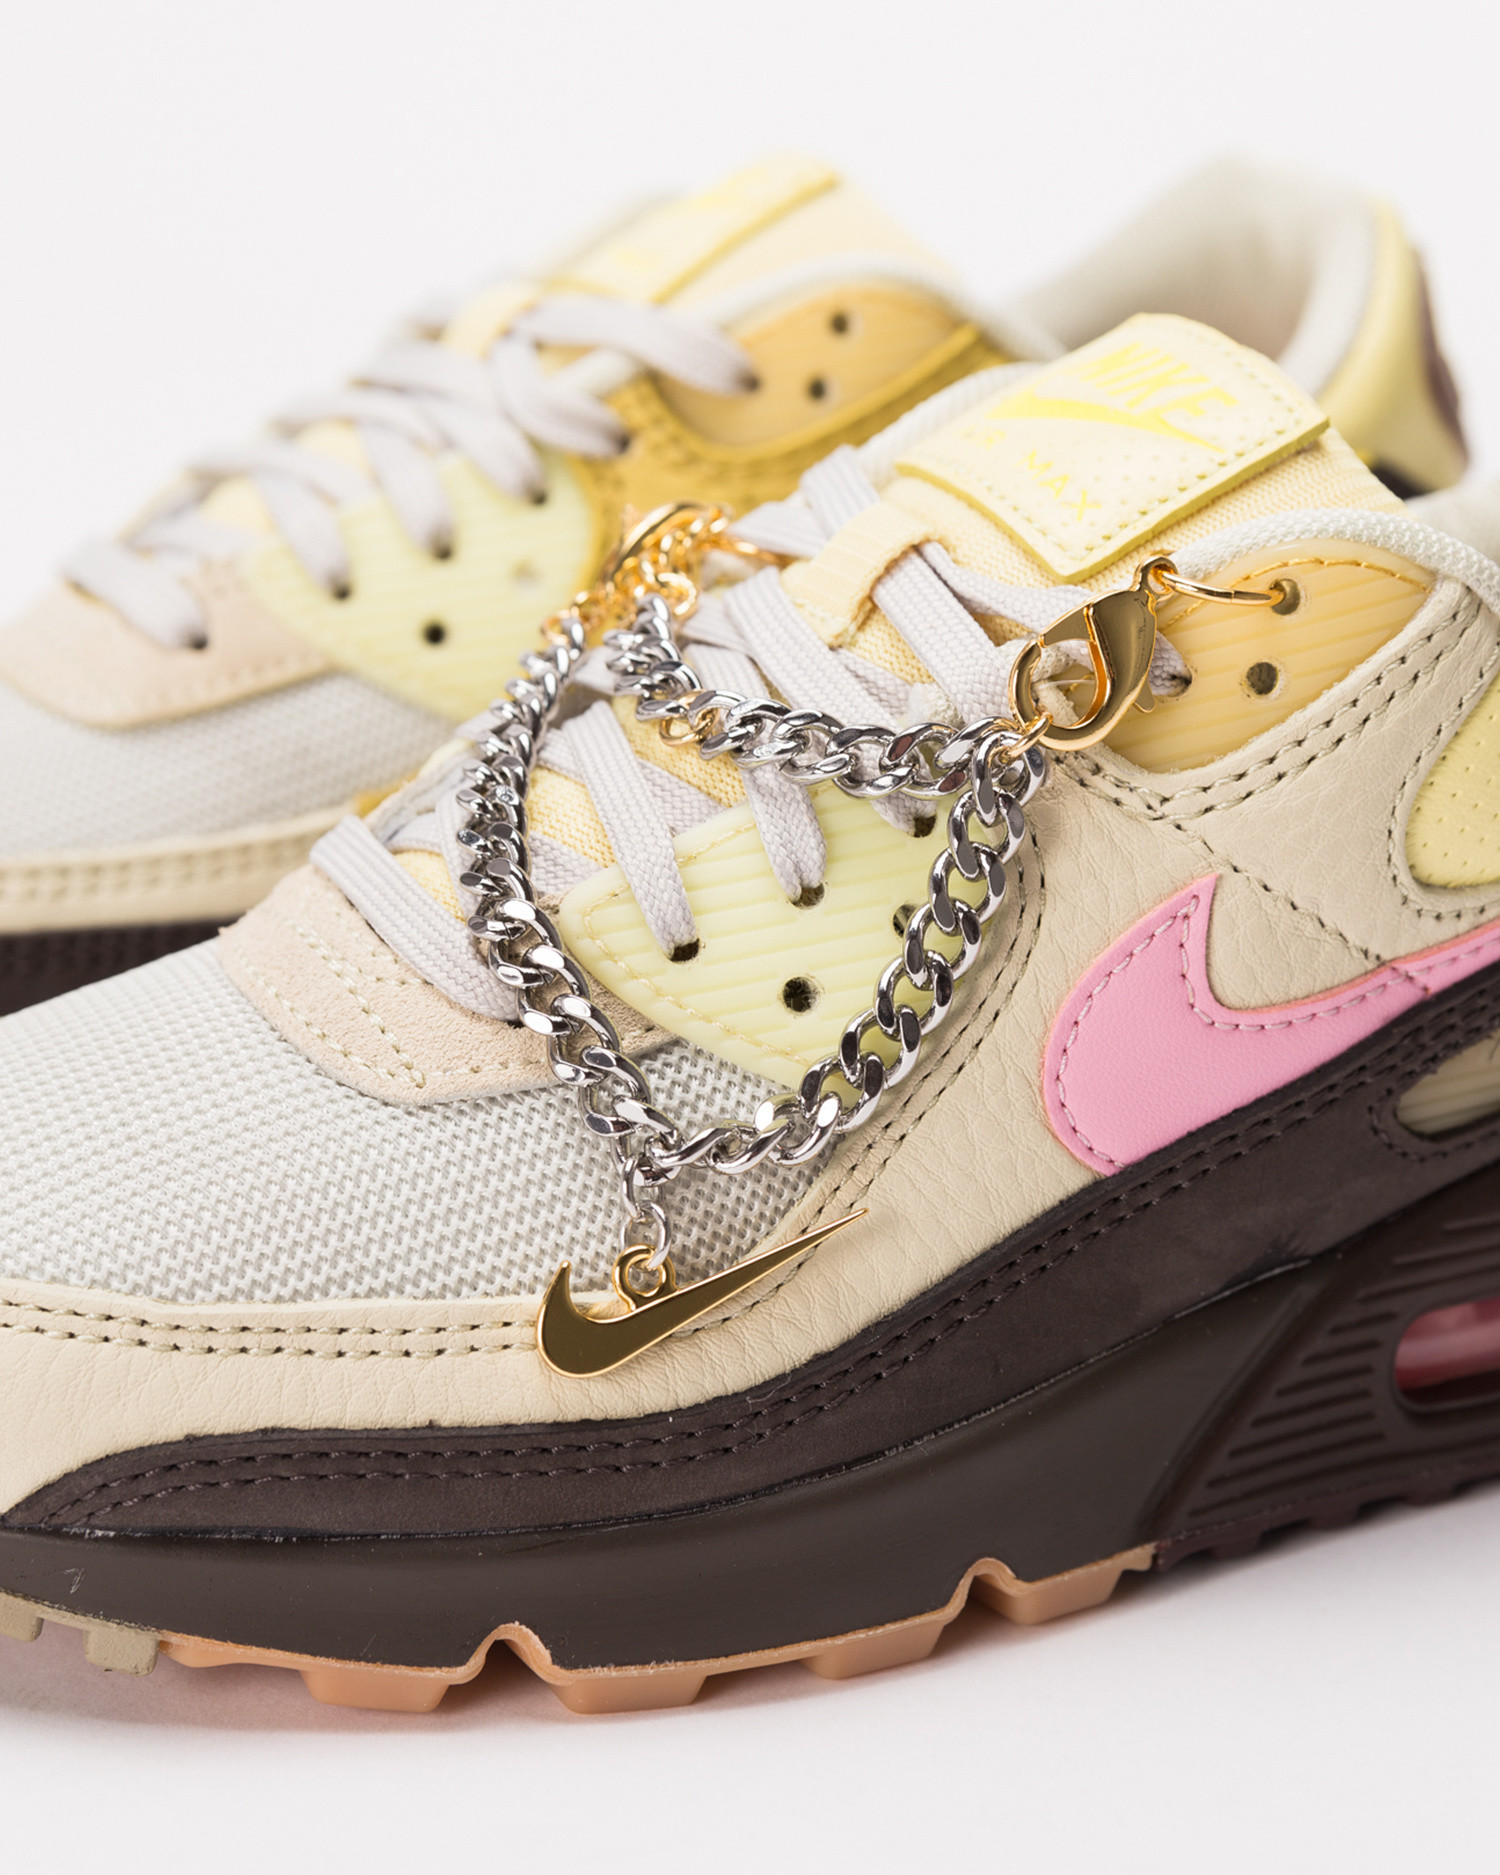 Nike Wmns Air Max 90 velvet brown/pink-lt british tan